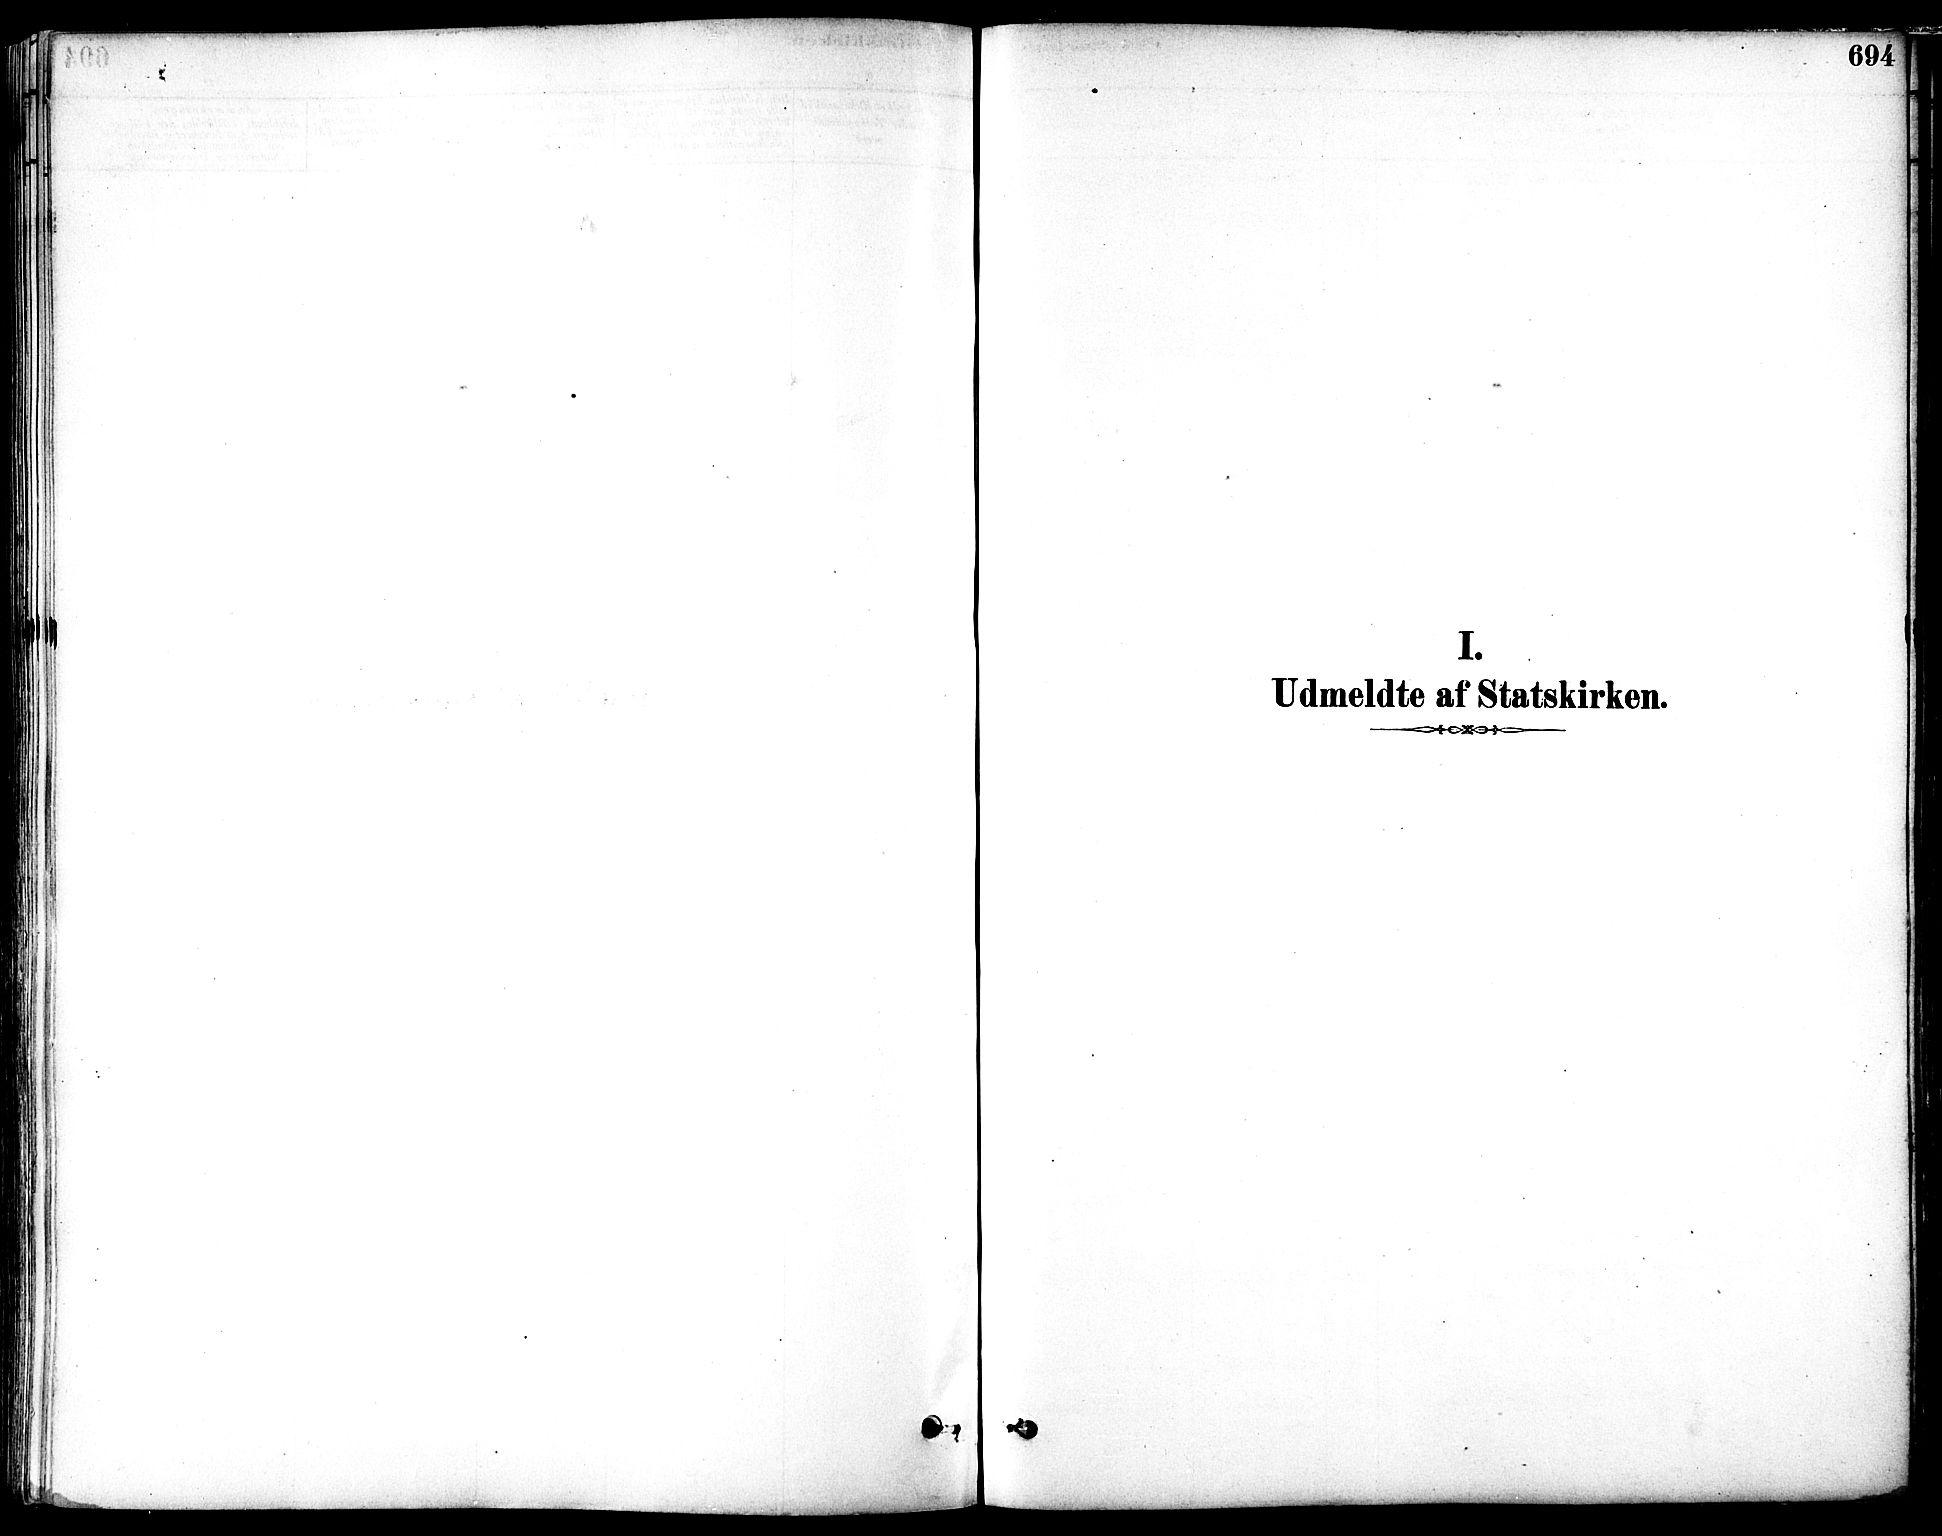 SAT, Ministerialprotokoller, klokkerbøker og fødselsregistre - Sør-Trøndelag, 601/L0058: Parish register (official) no. 601A26, 1877-1891, p. 694